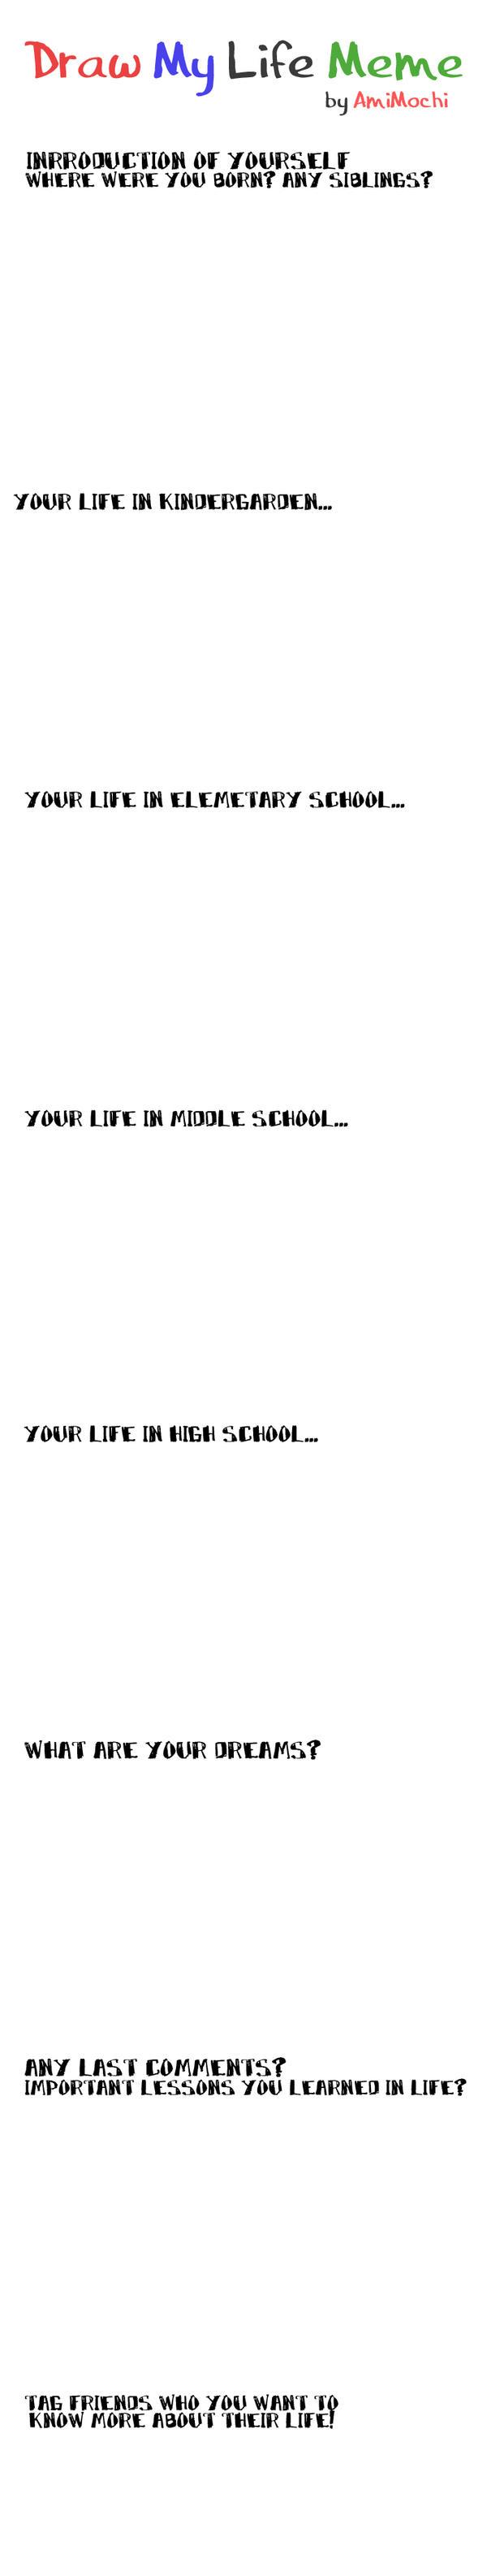 Draw My Life Meme by AmiMochi on DeviantArt